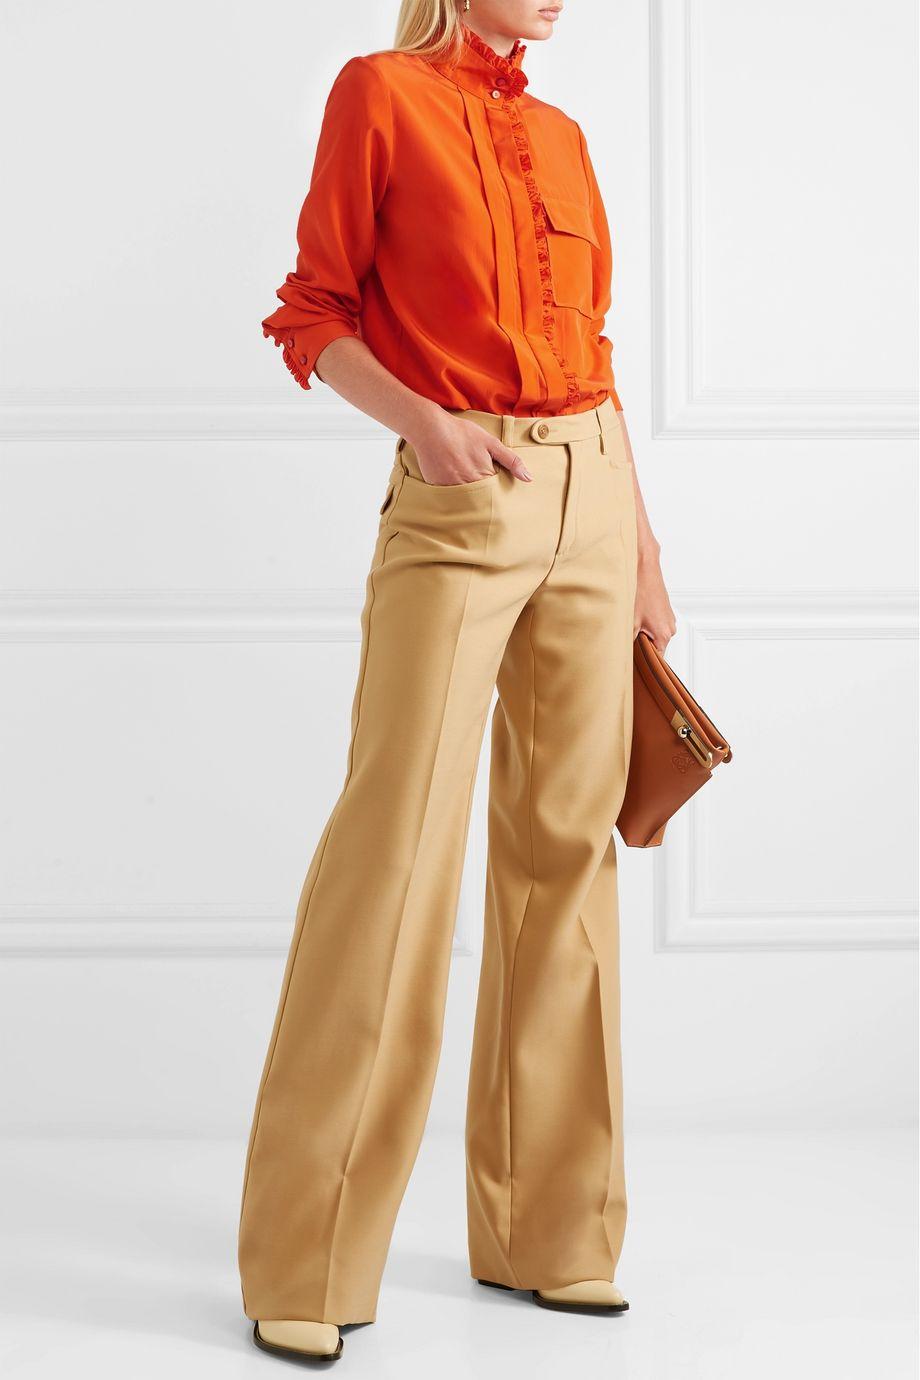 Chloé Ruffled silk crepe de chine shirt